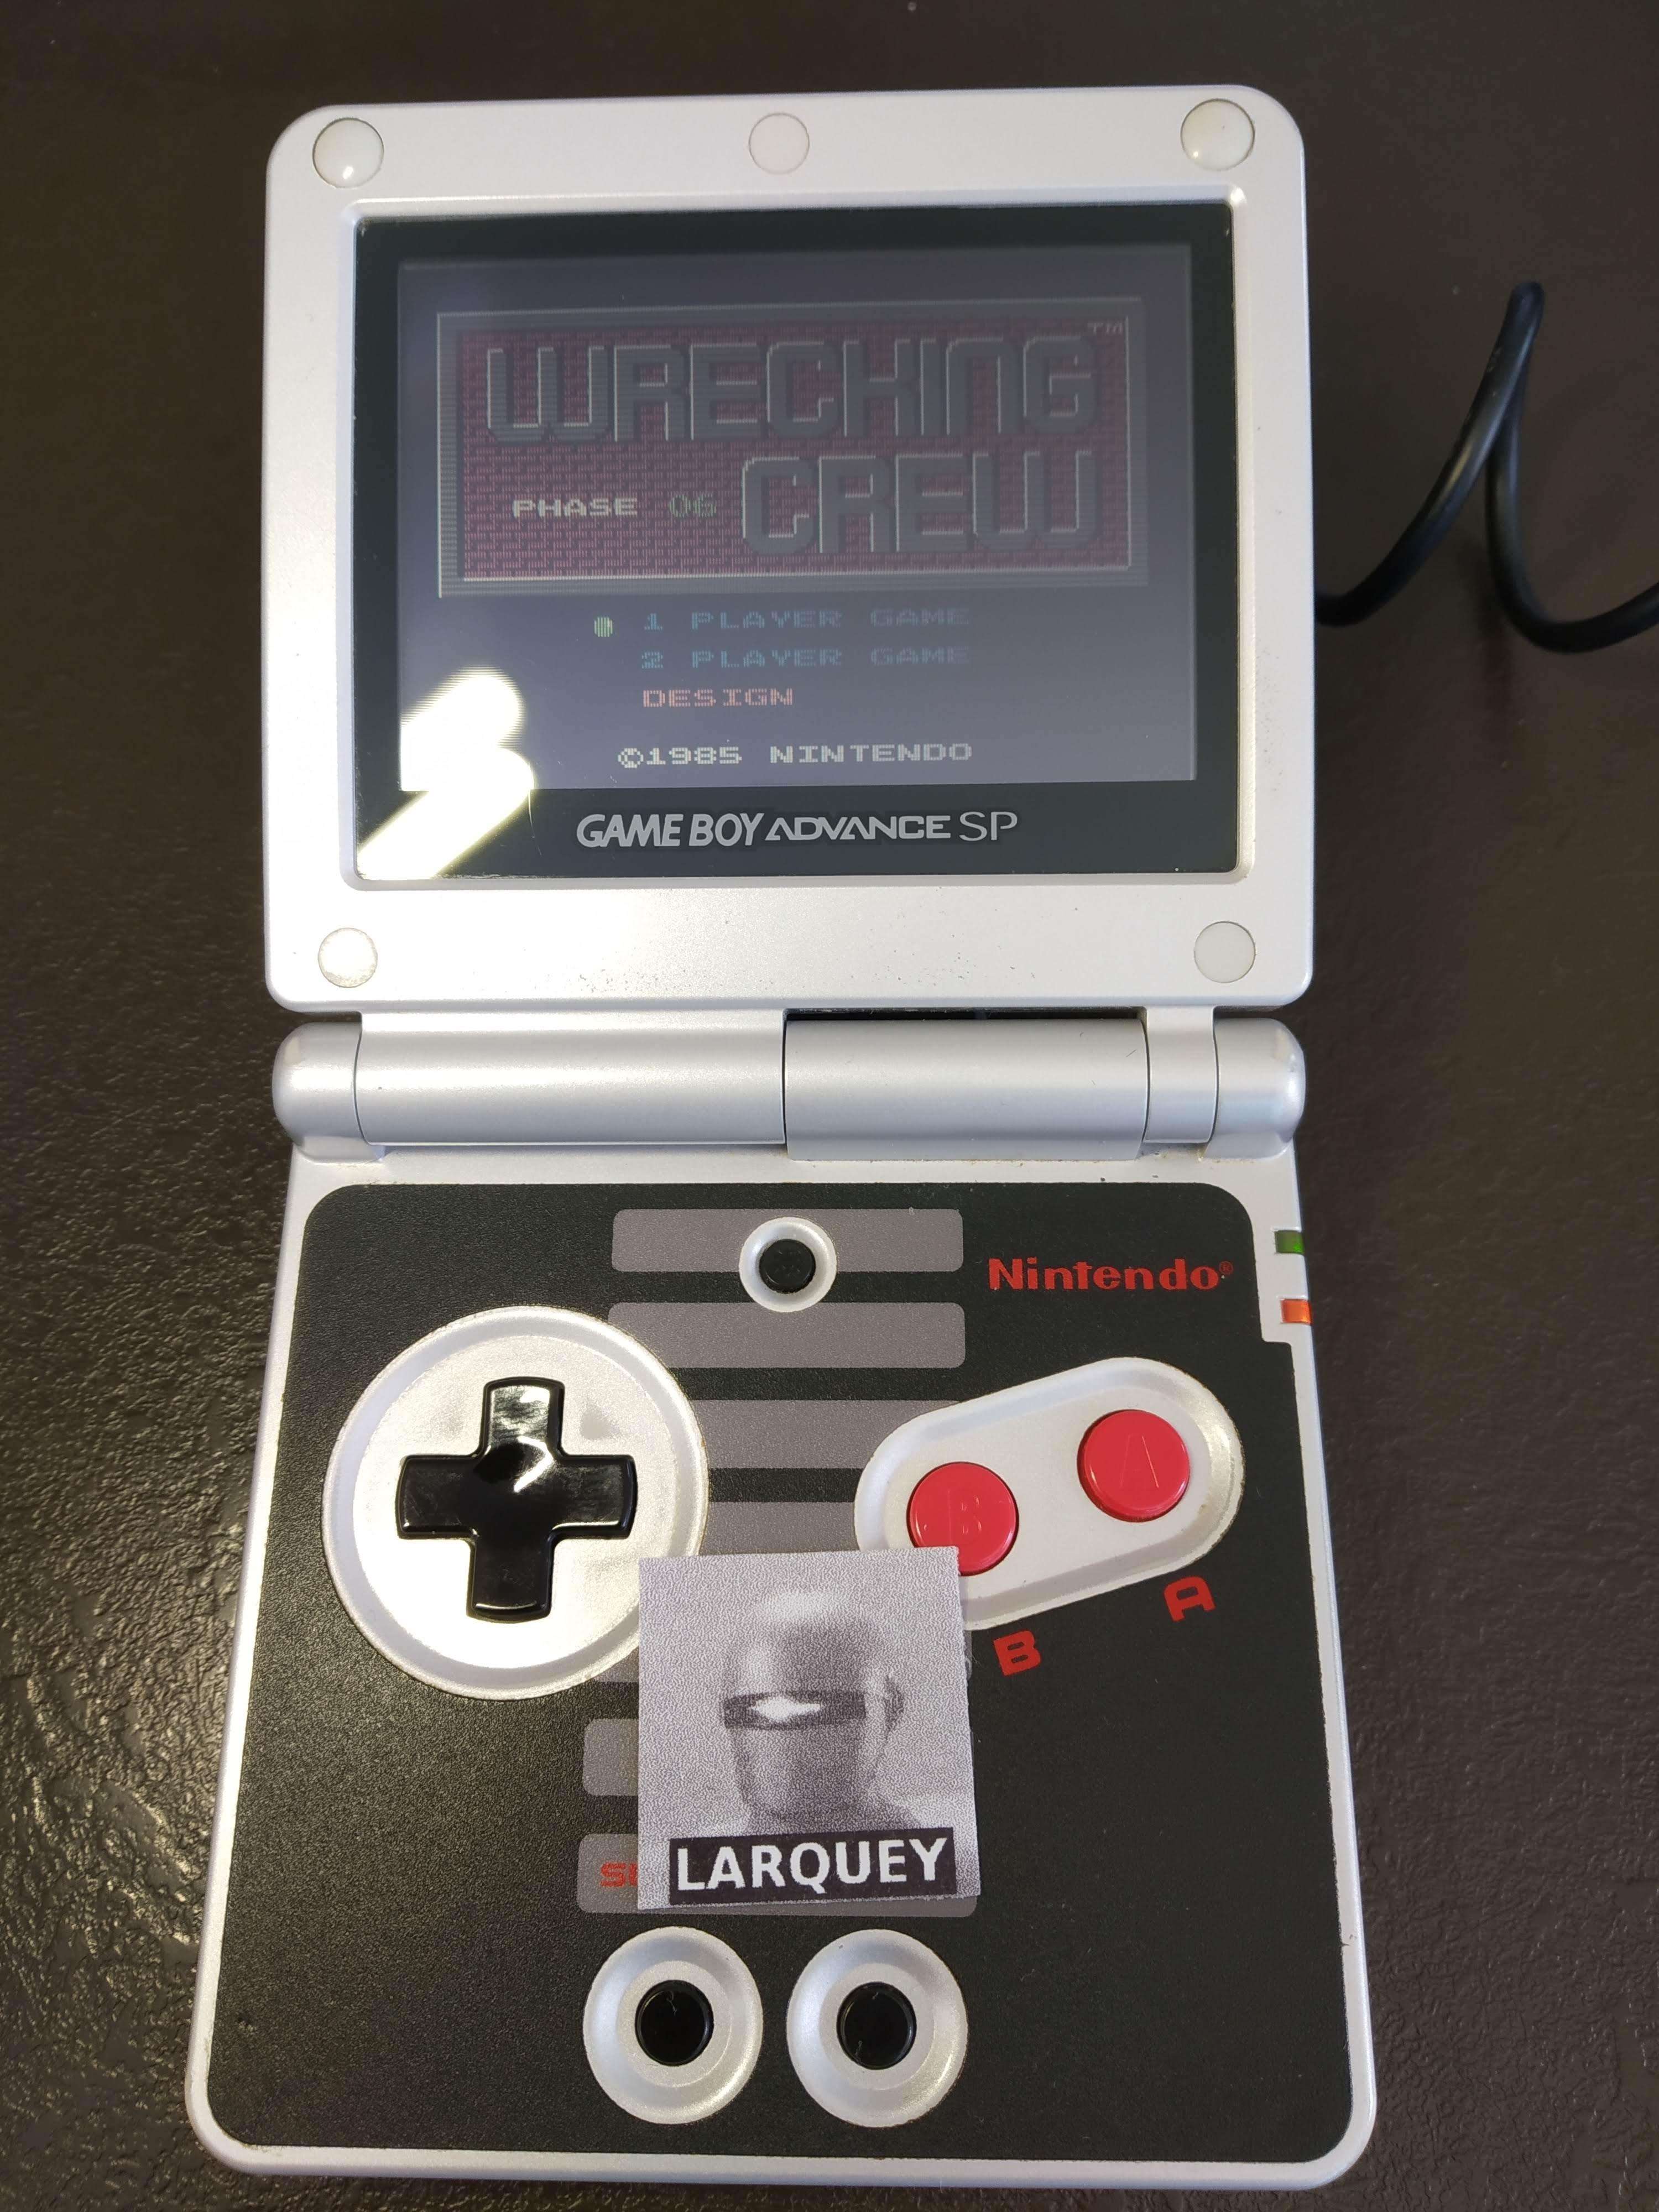 Larquey: Famicom Mini Vol. 14: Wrecking Crew (GBA) 41,600 points on 2019-12-27 06:49:14